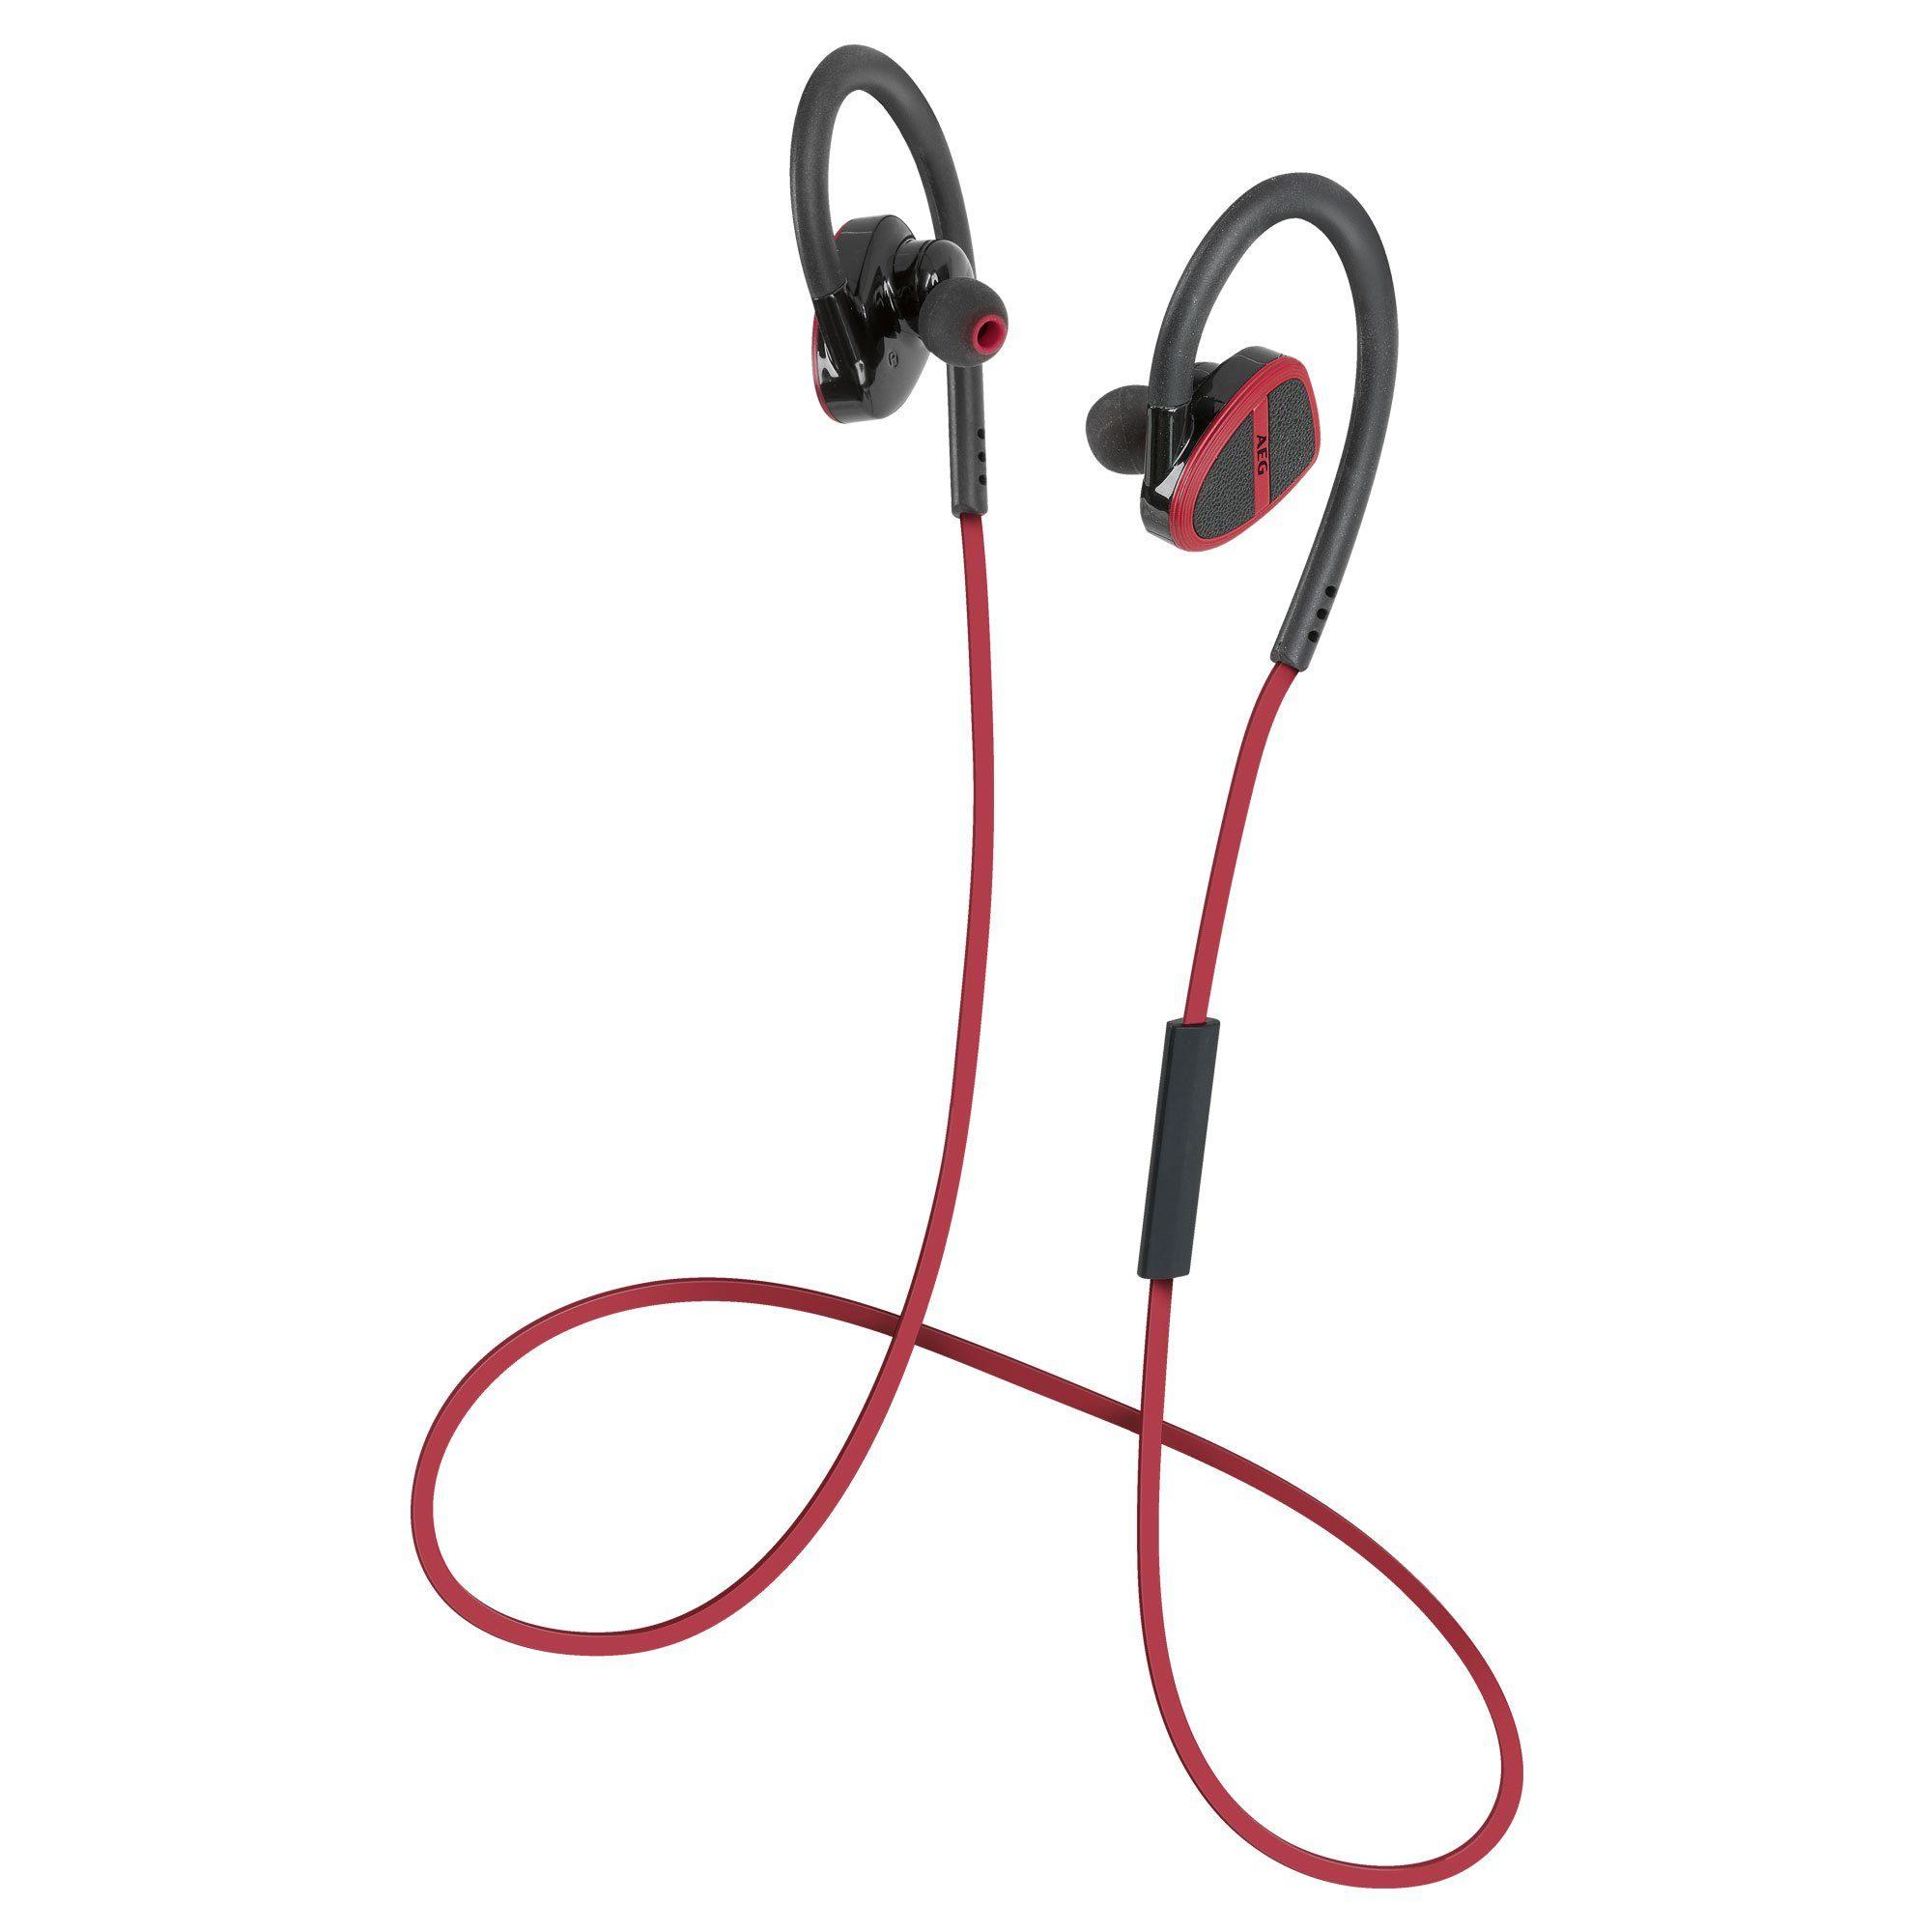 AEG Bluetooth-Kopfhörer, In-Ear inkl. Freisprecheinrichtung »KH 4232 BT«